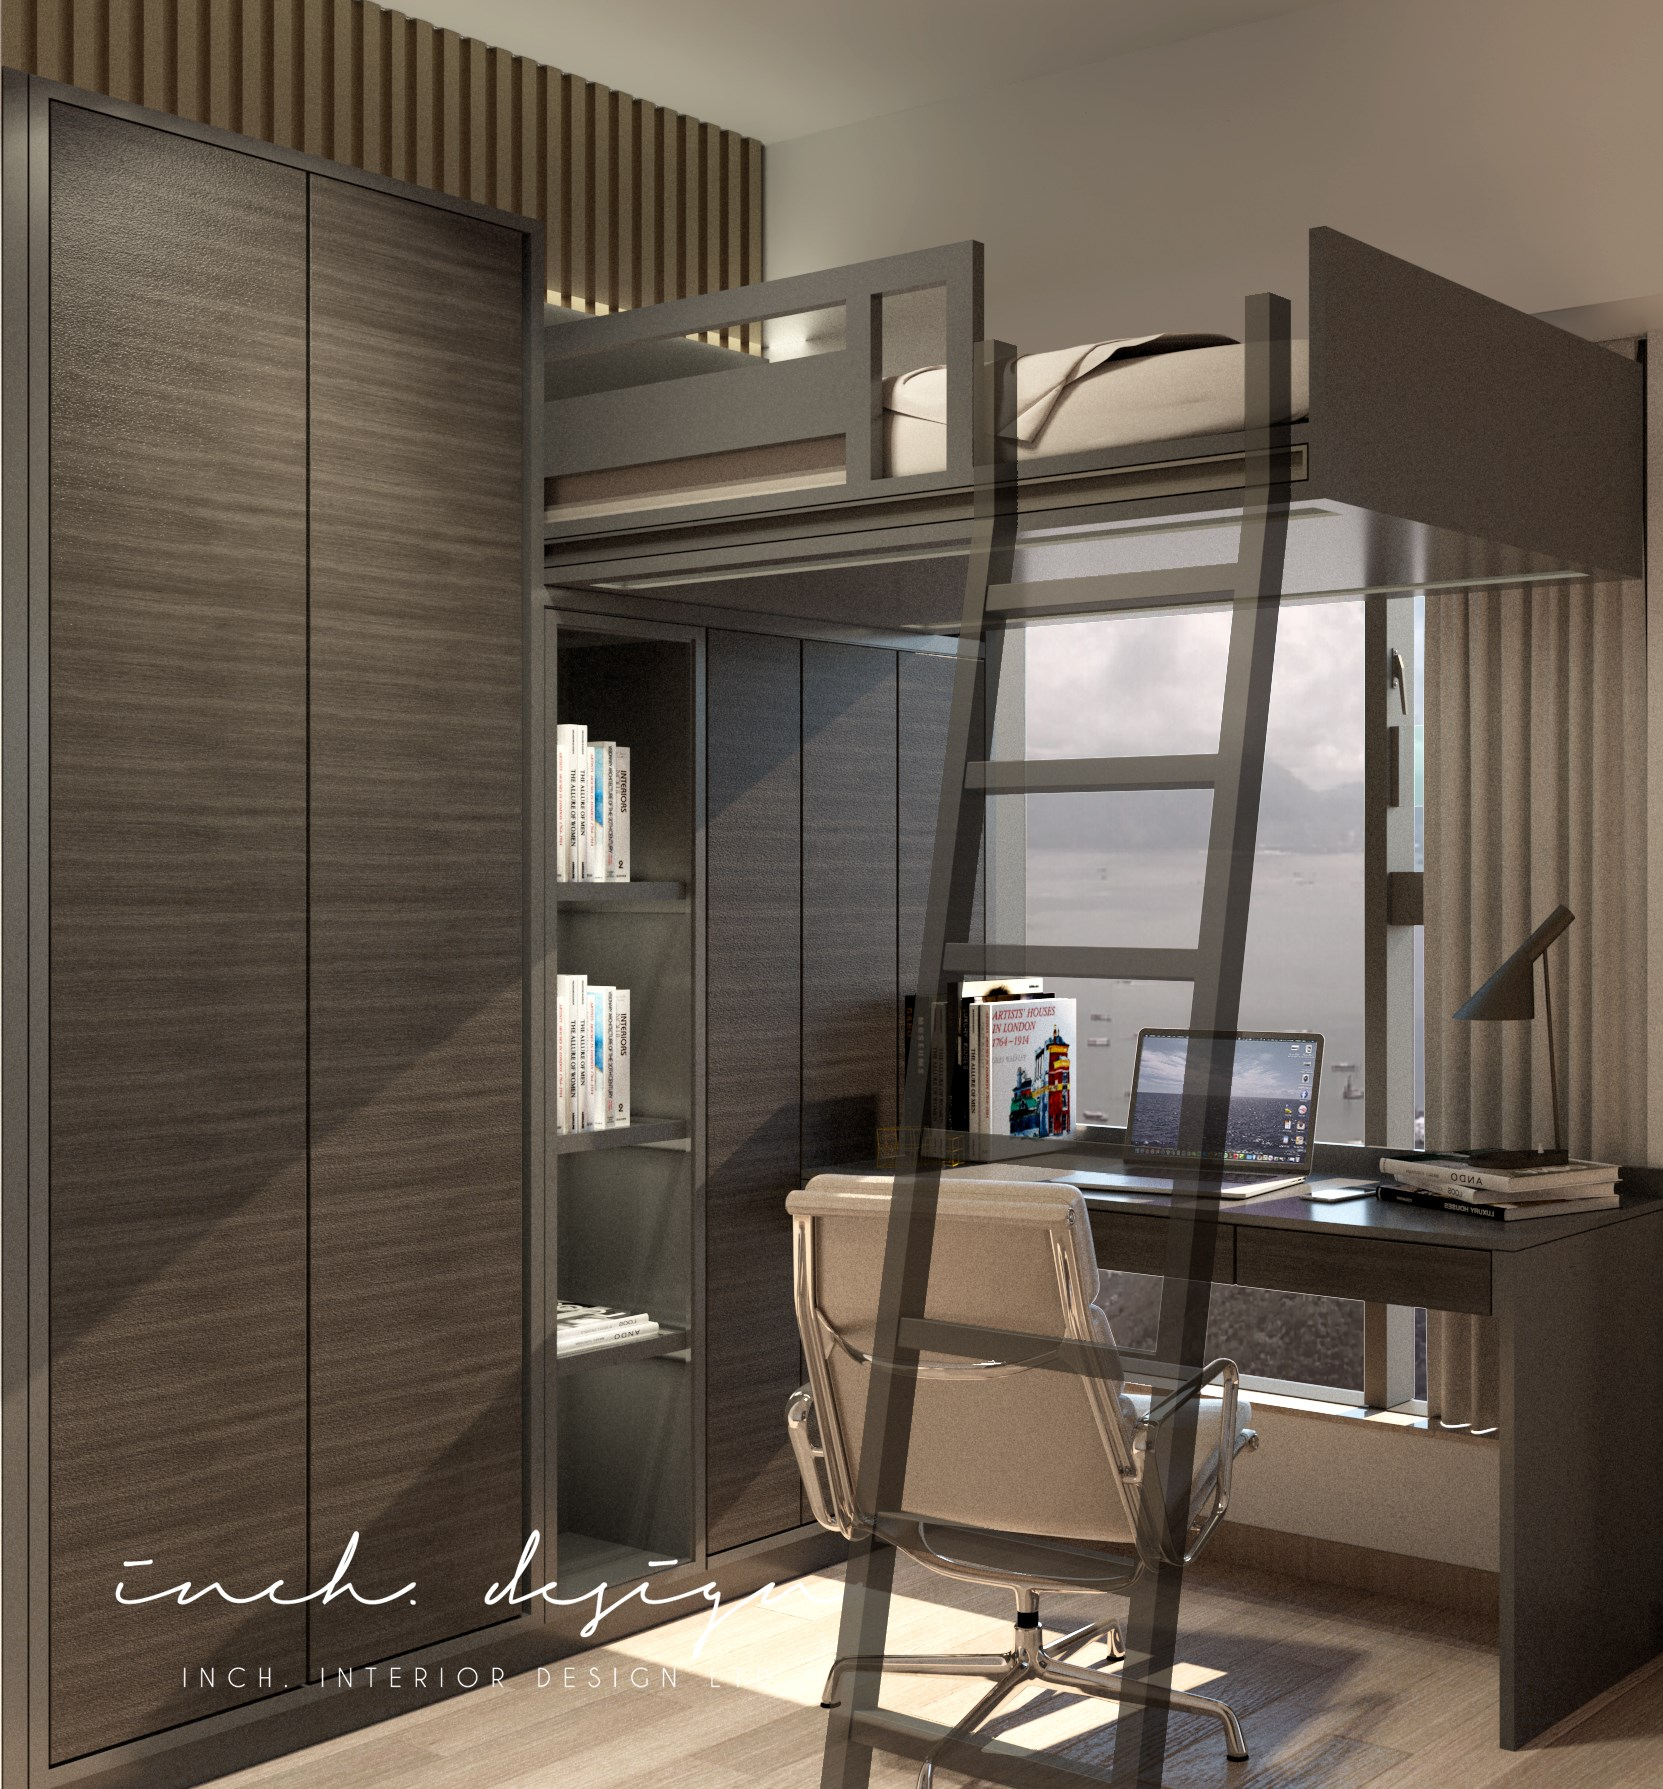 Inch Interior Design Victoria Skye Concept Image 004